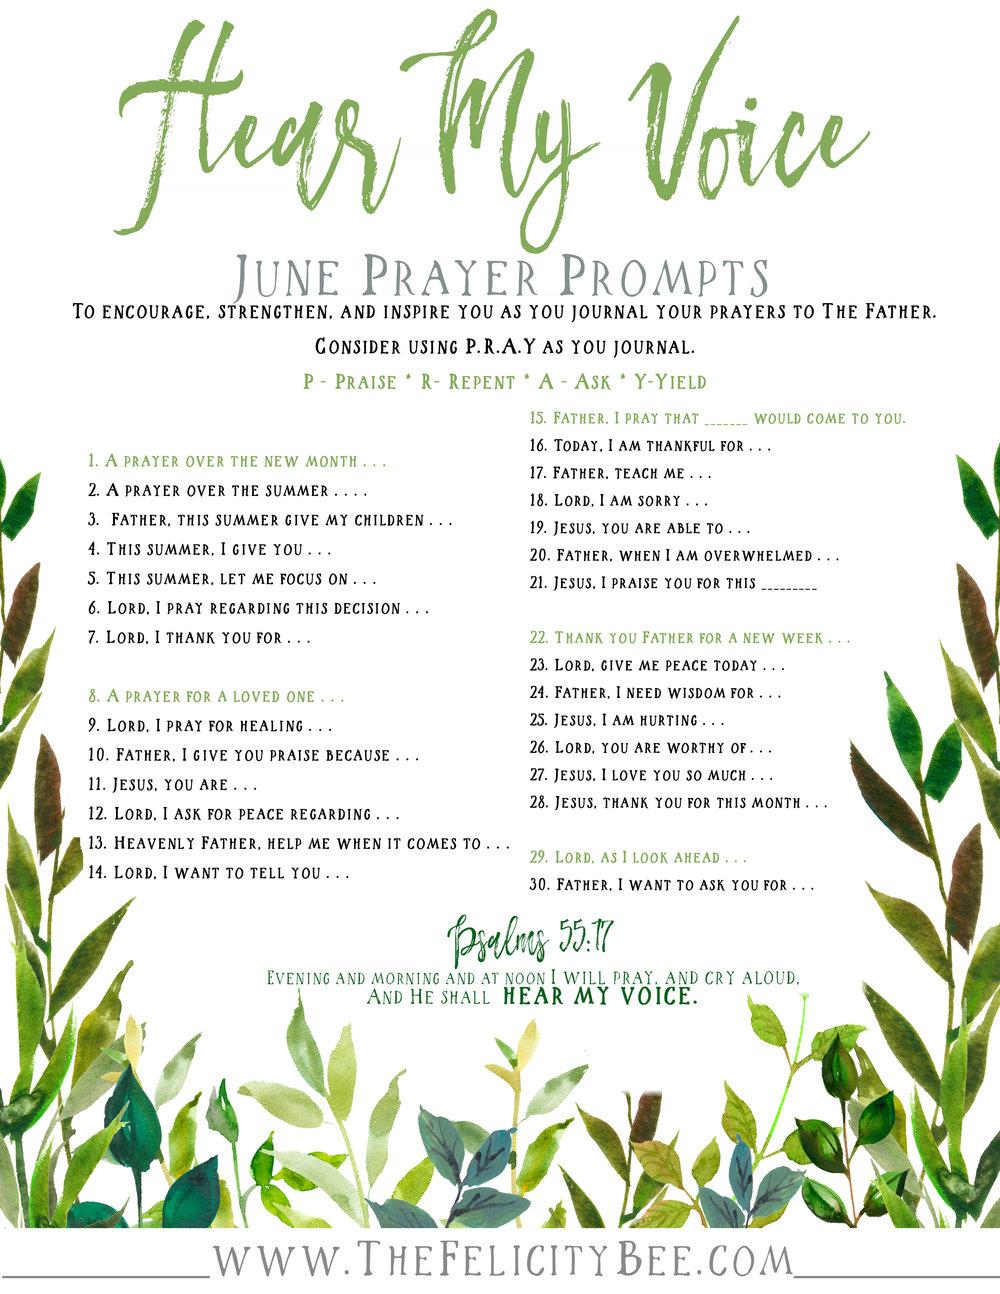 Hear My Voice Prayer Prompts.